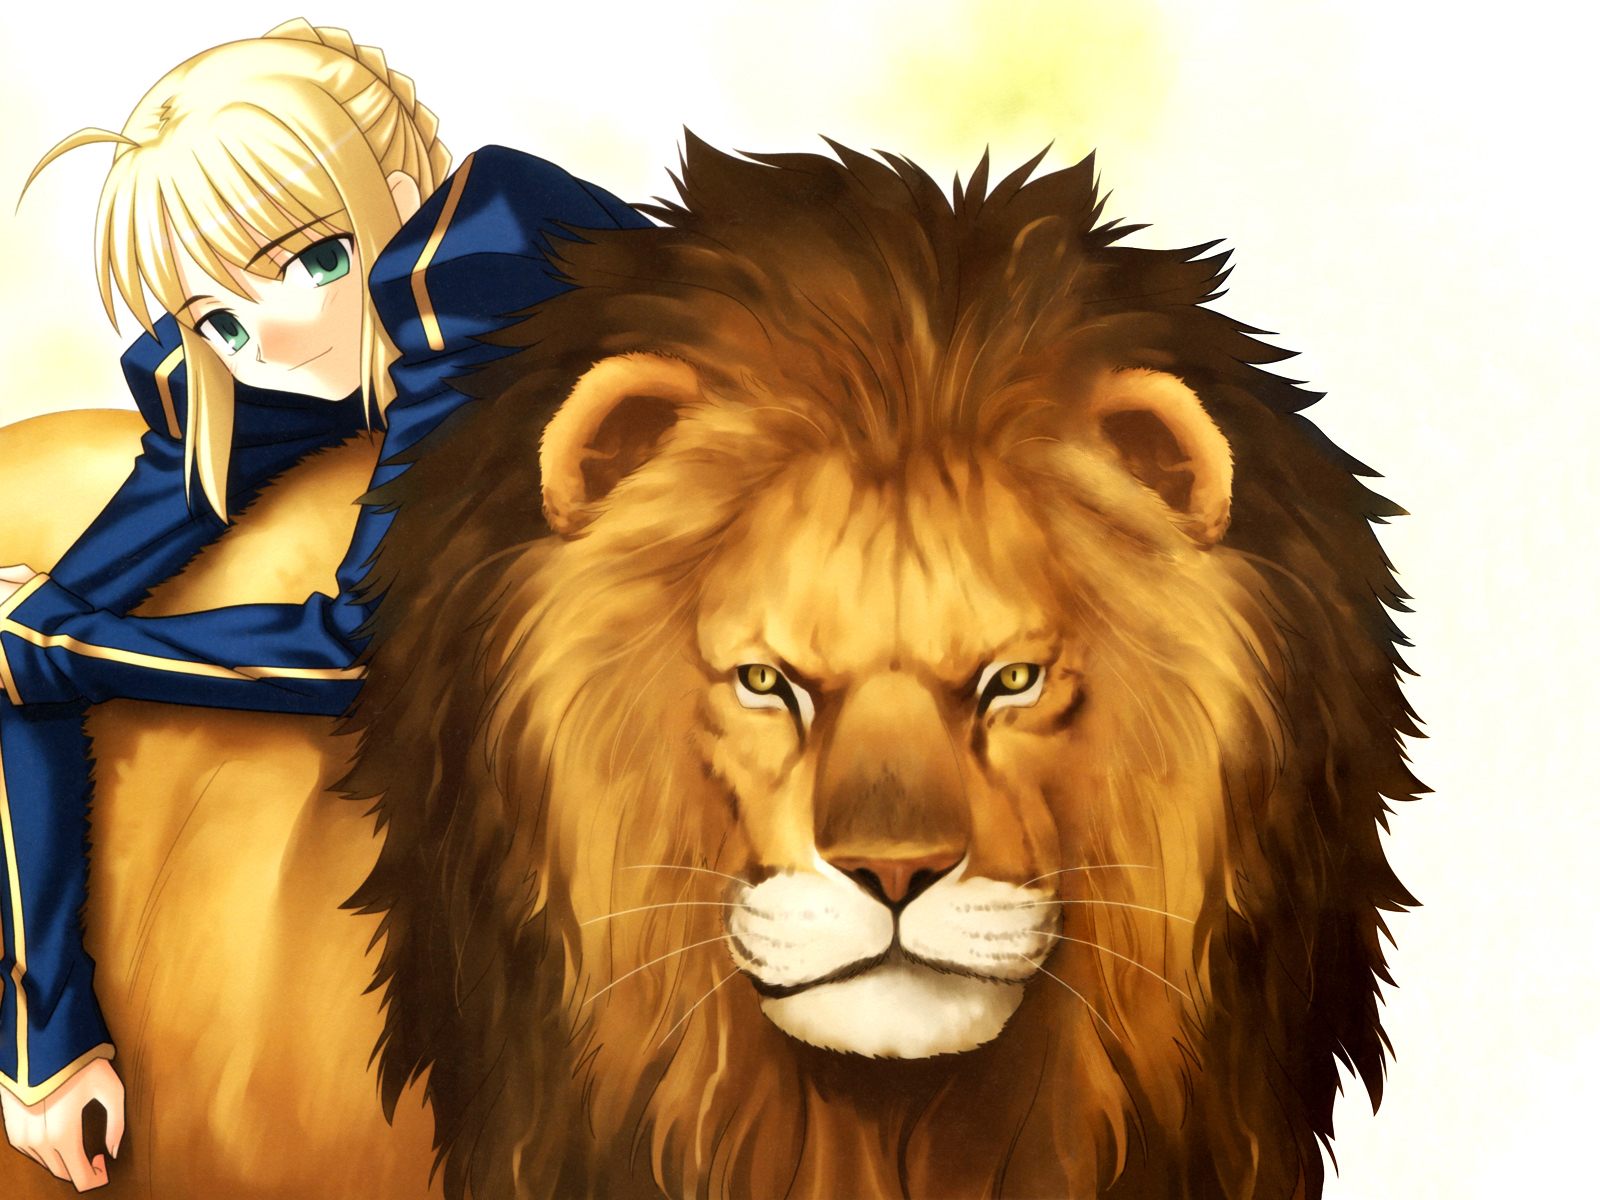 animal artoria_pendragon_(all) blonde_hair fate_(series) fate/stay_night green_eyes lion saber short_hair tagme_(artist) yellow_eyes